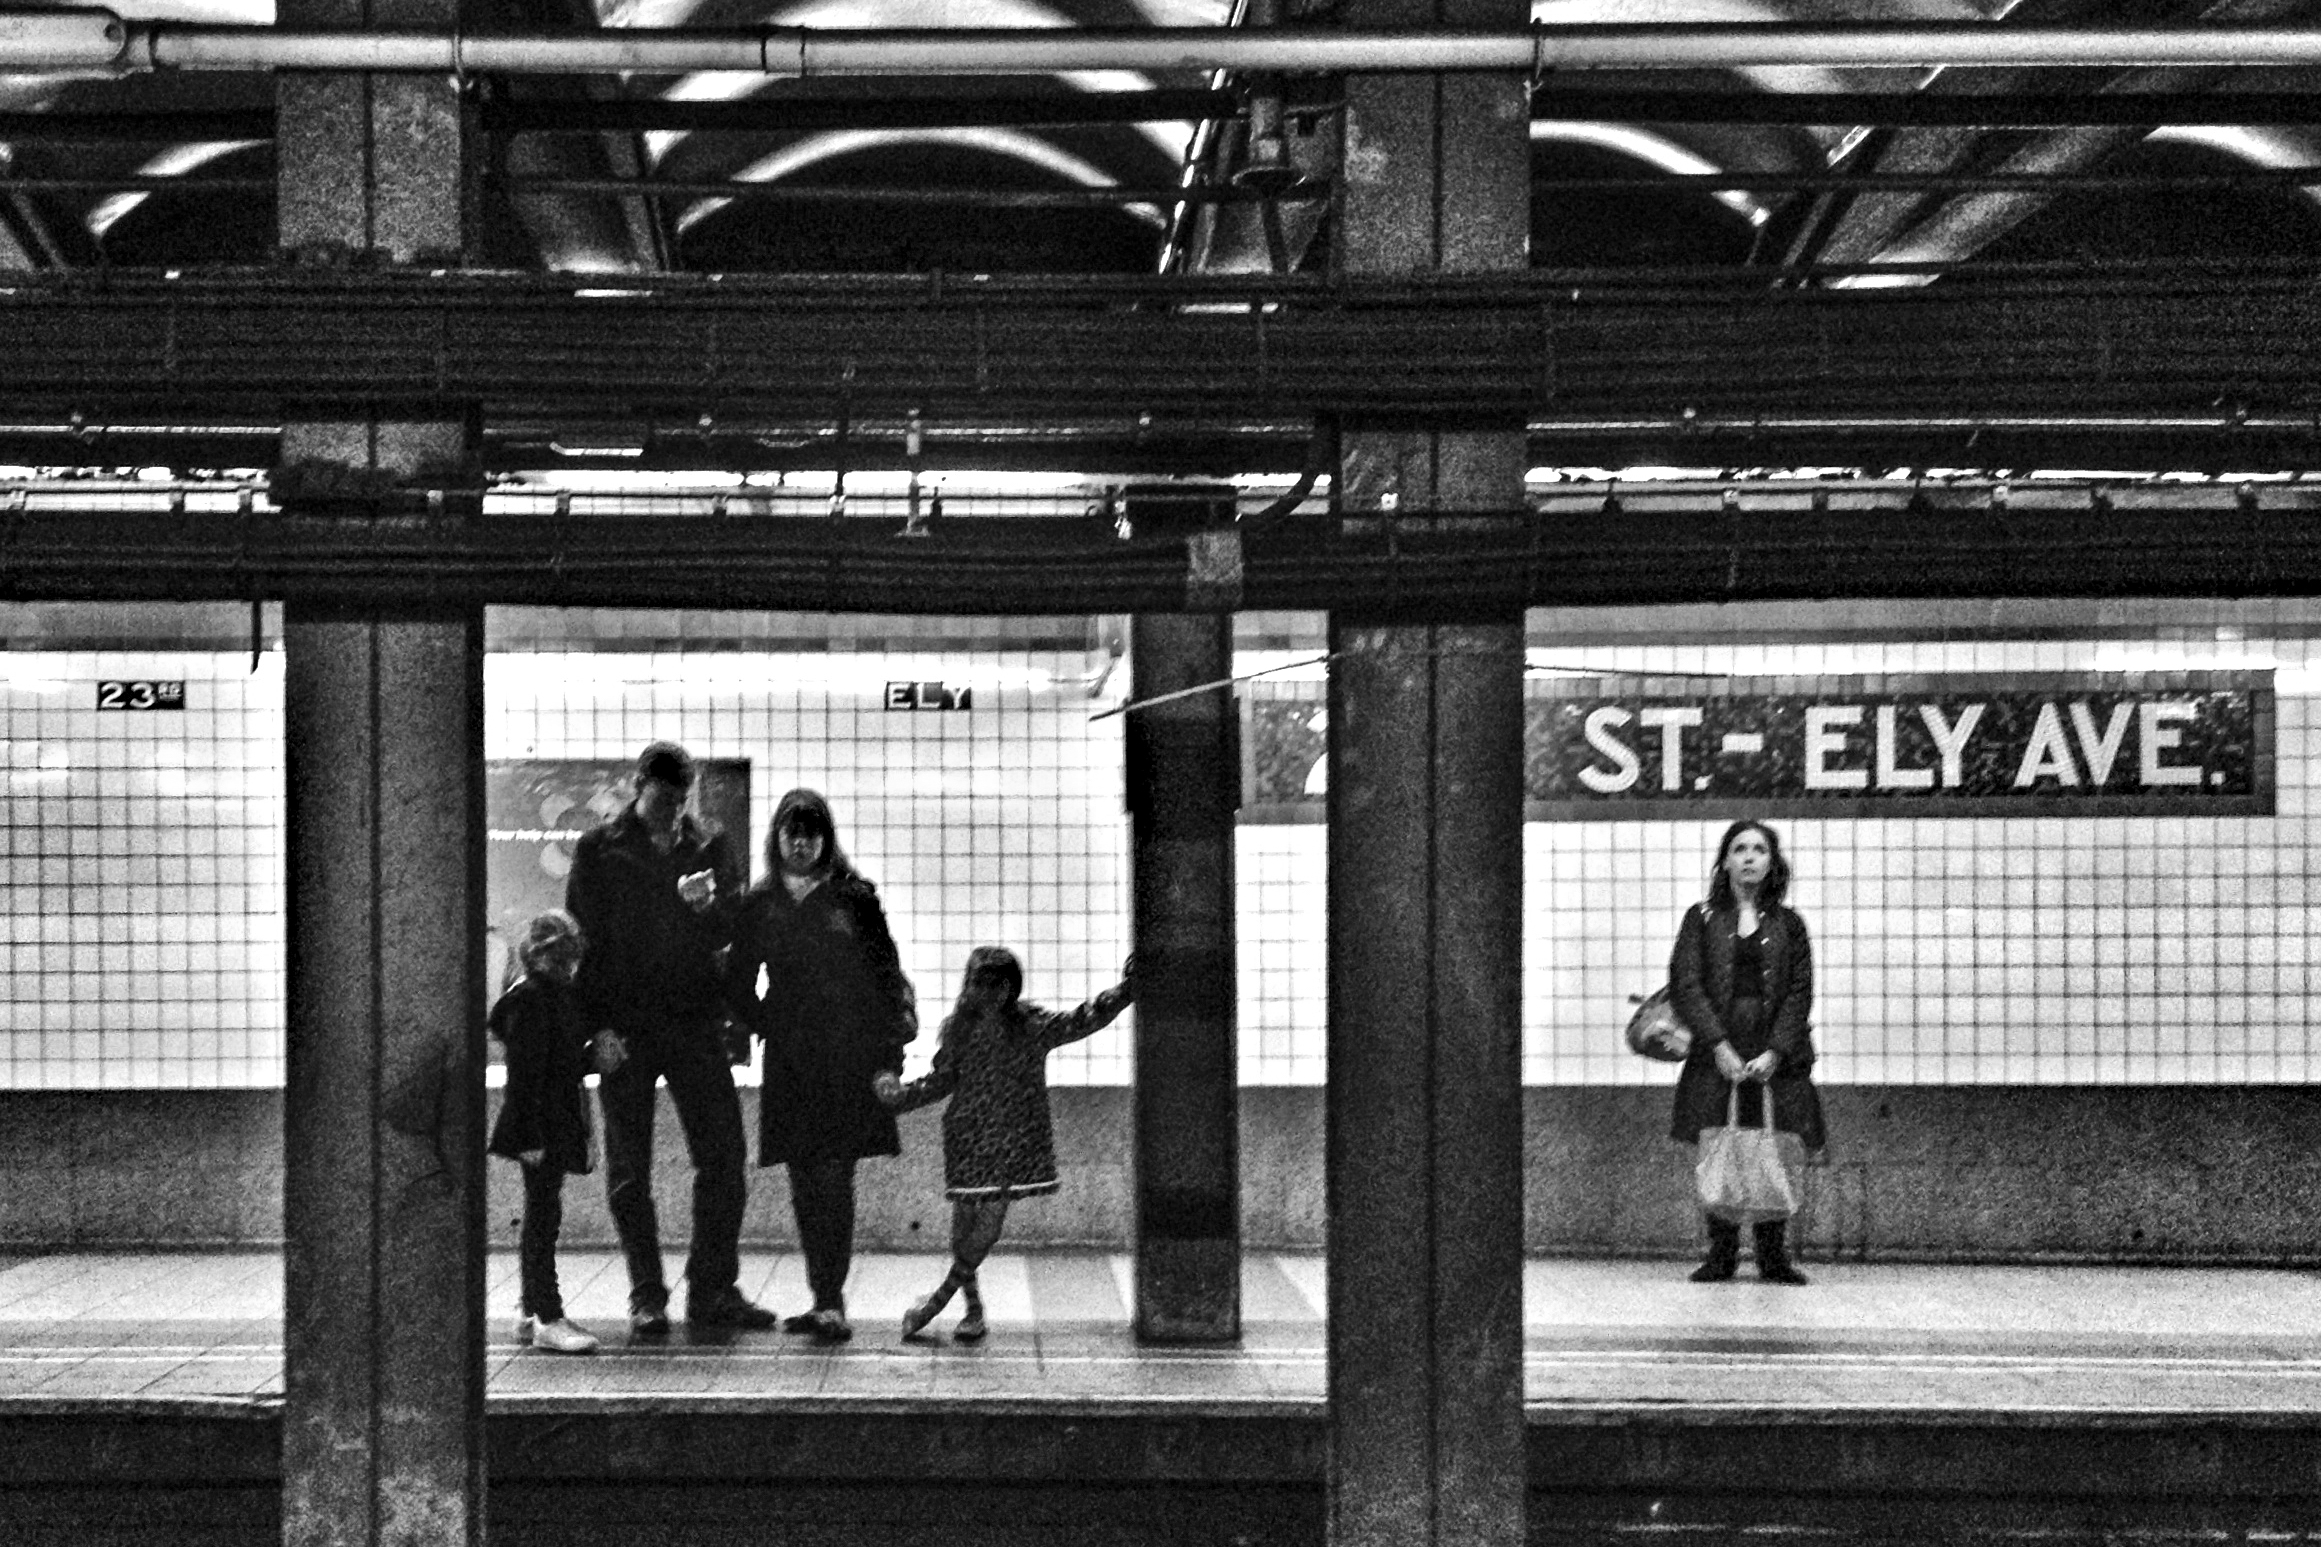 Snowstorm_Subway 06.jpg